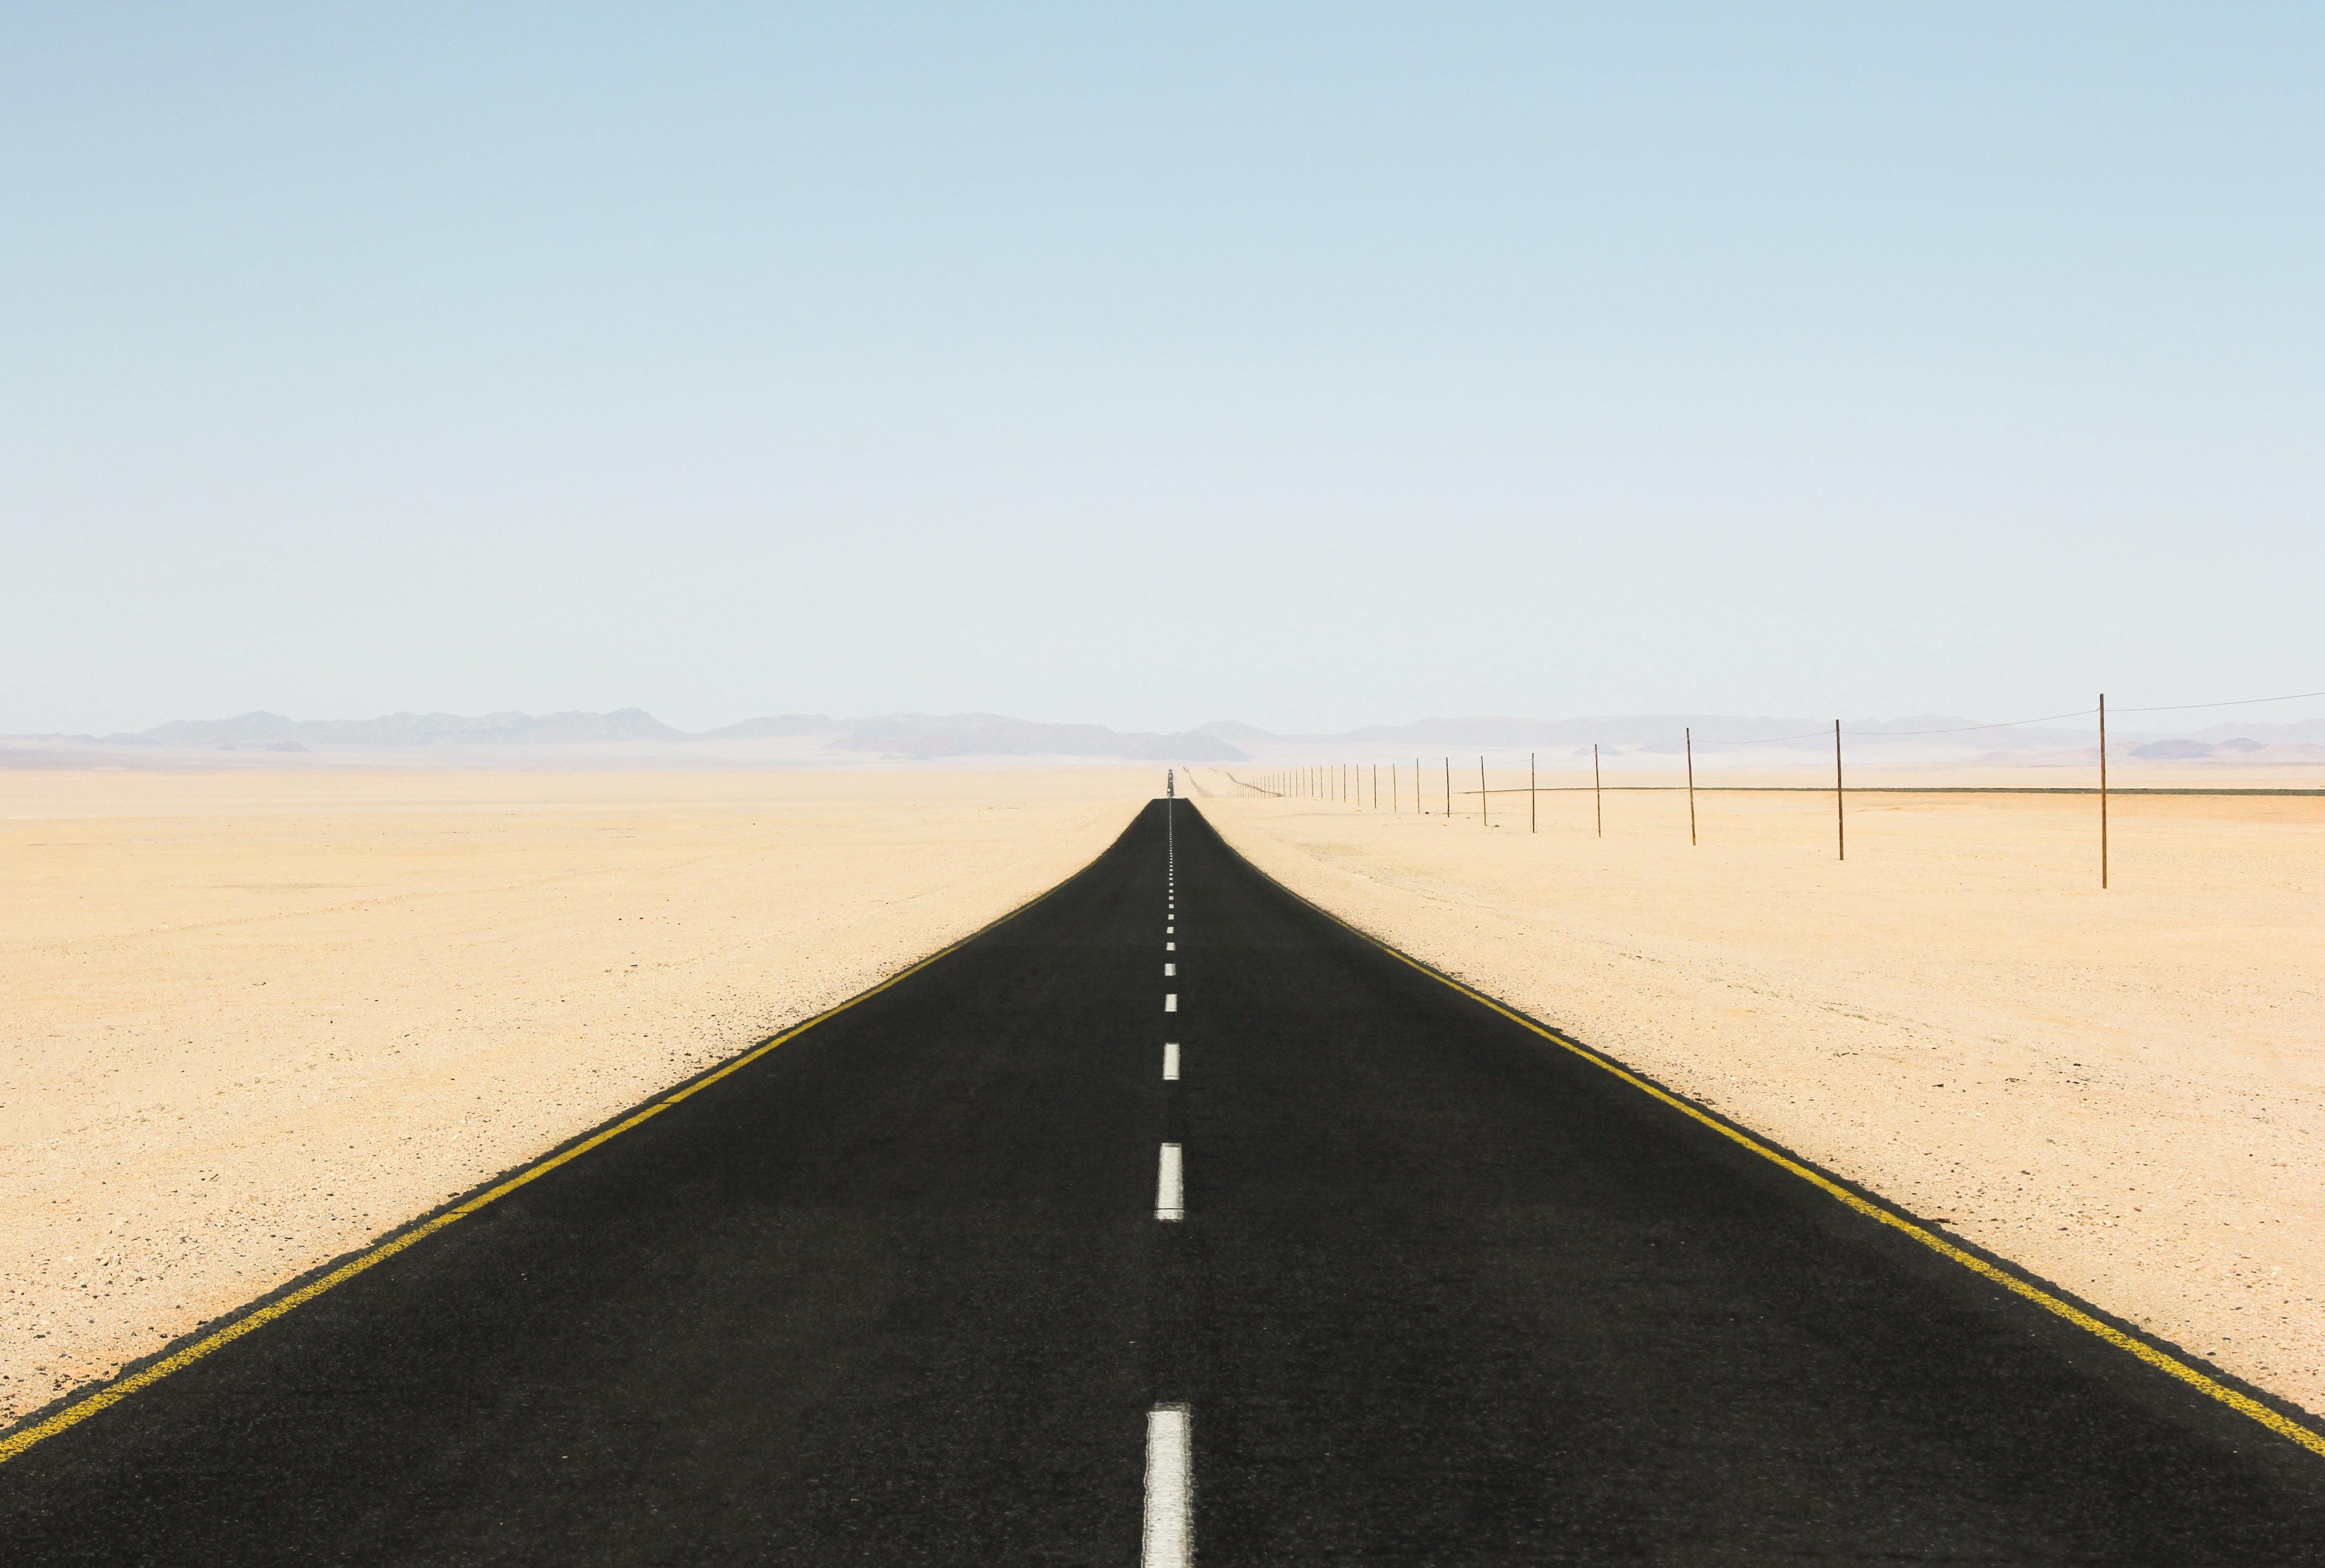 sand-road-clipart-2.jpg